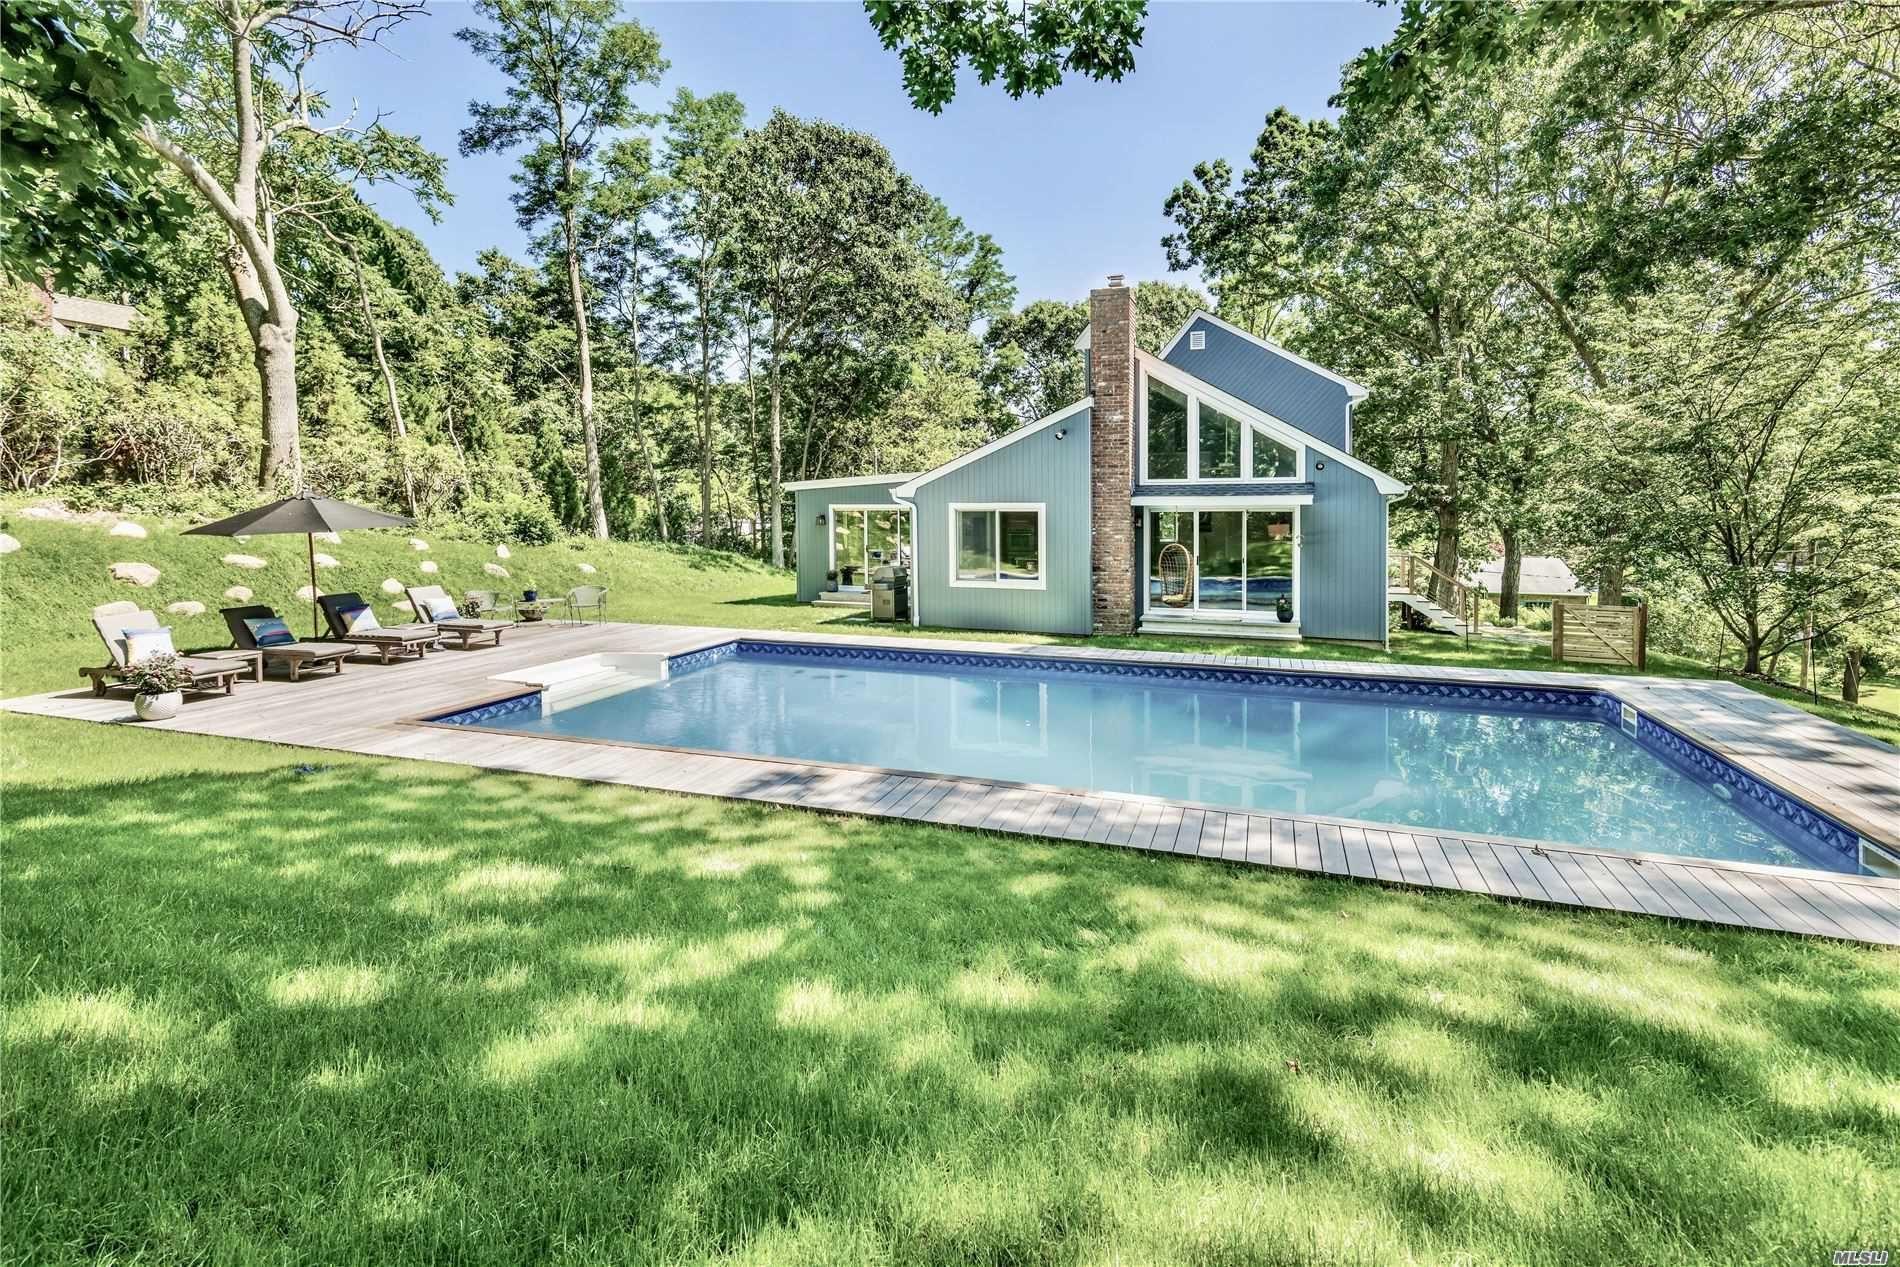 39 Lake Drive, Shelter Island, NY 11964 - MLS#: 3142270